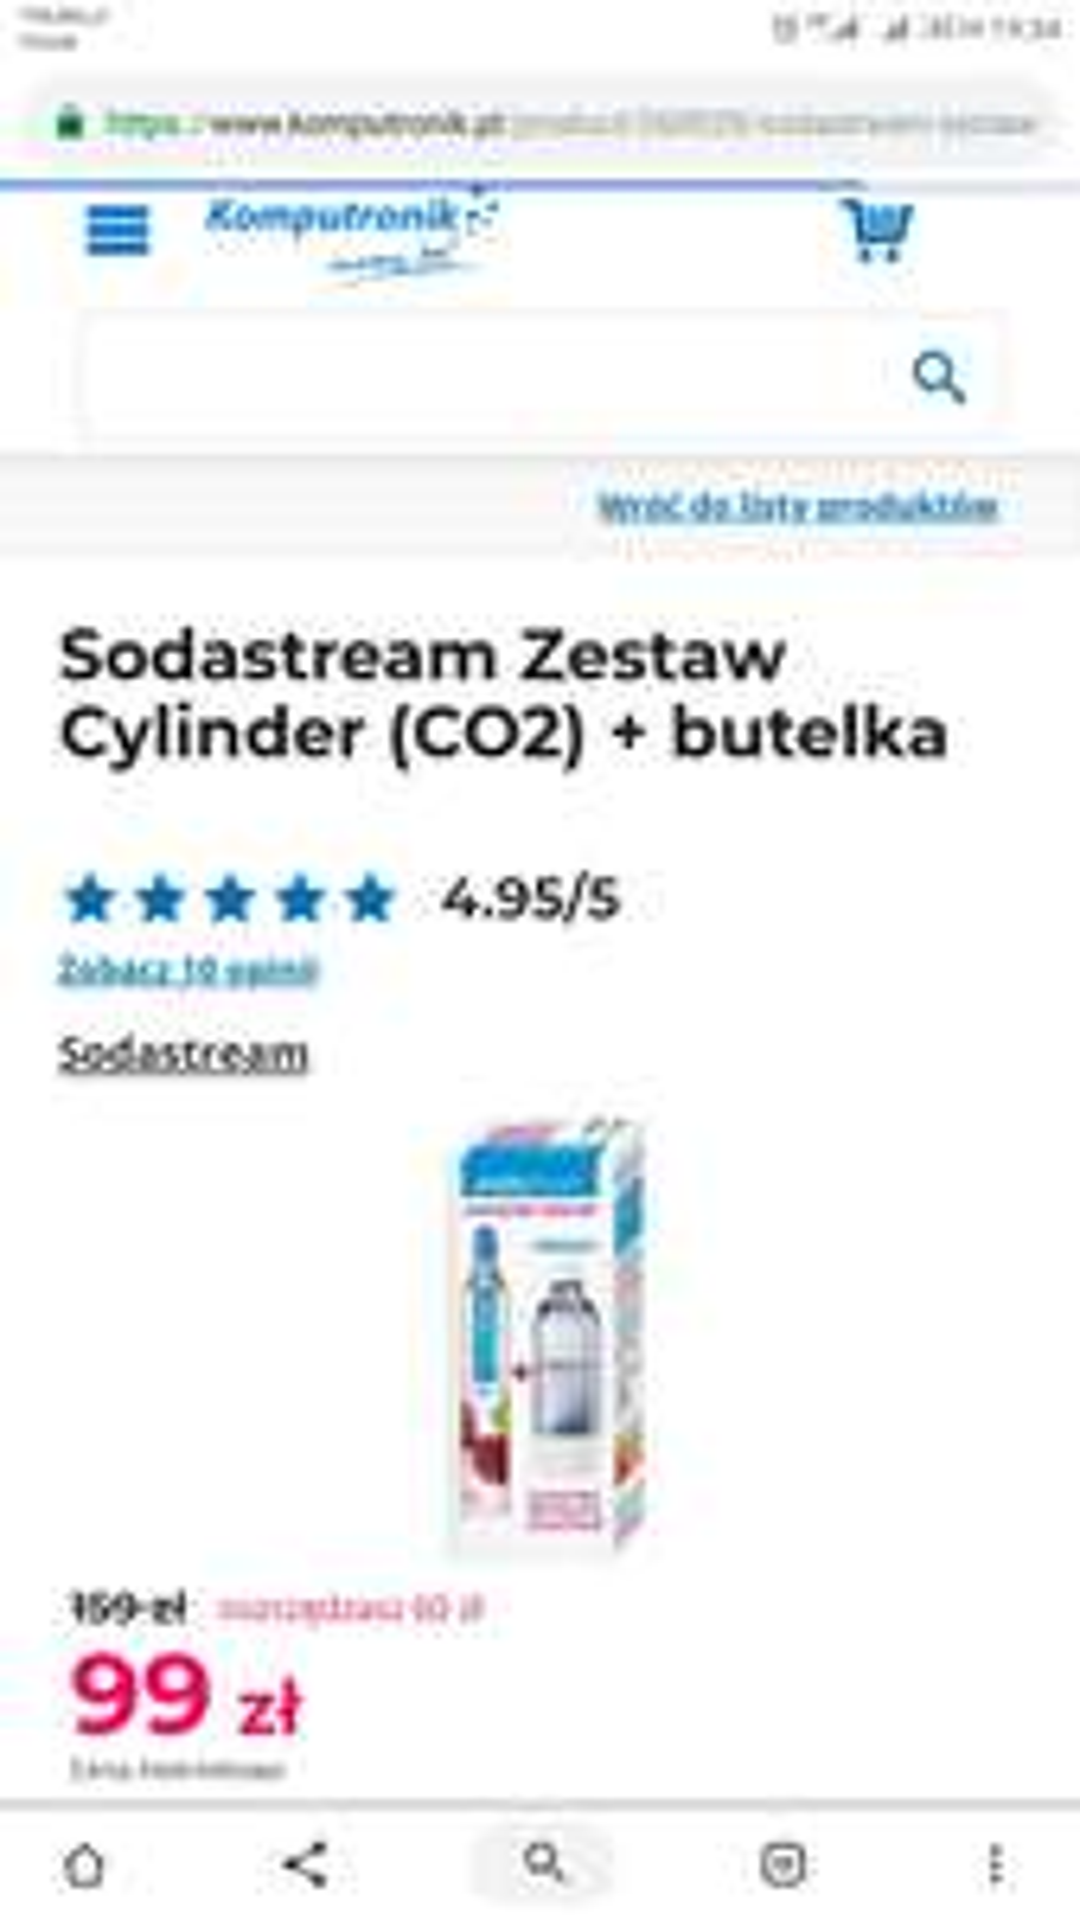 Sodastream - zestaw cylinder (CO2) + butelka 1L